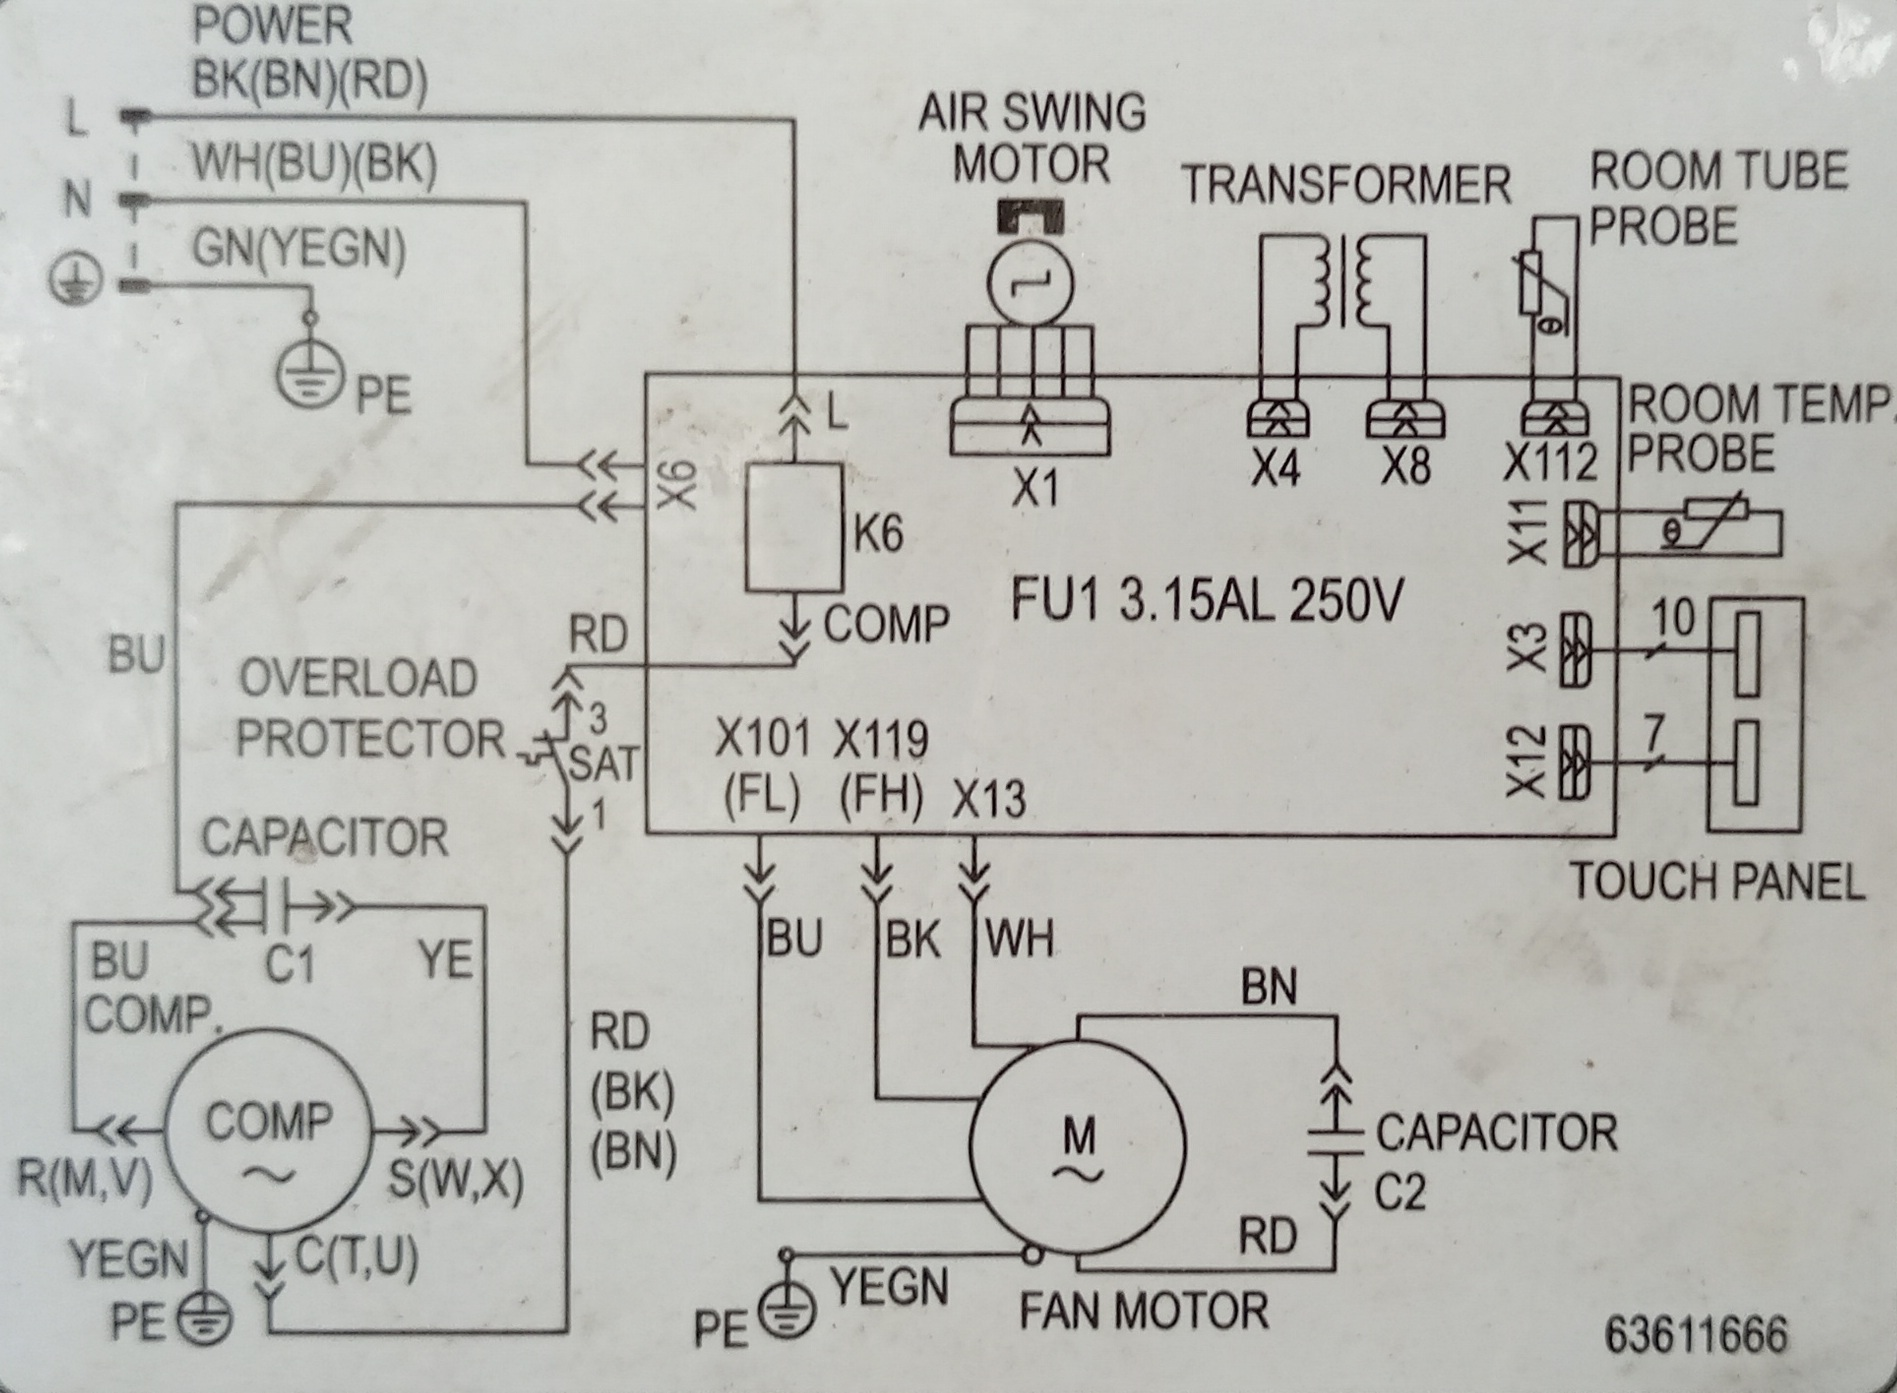 Window AC PCB Wiring Diagram | Electrical Wiring Diagrams Platform | Window Aircon Wiring Diagram |  | Electrical Wiring Diagrams Platform